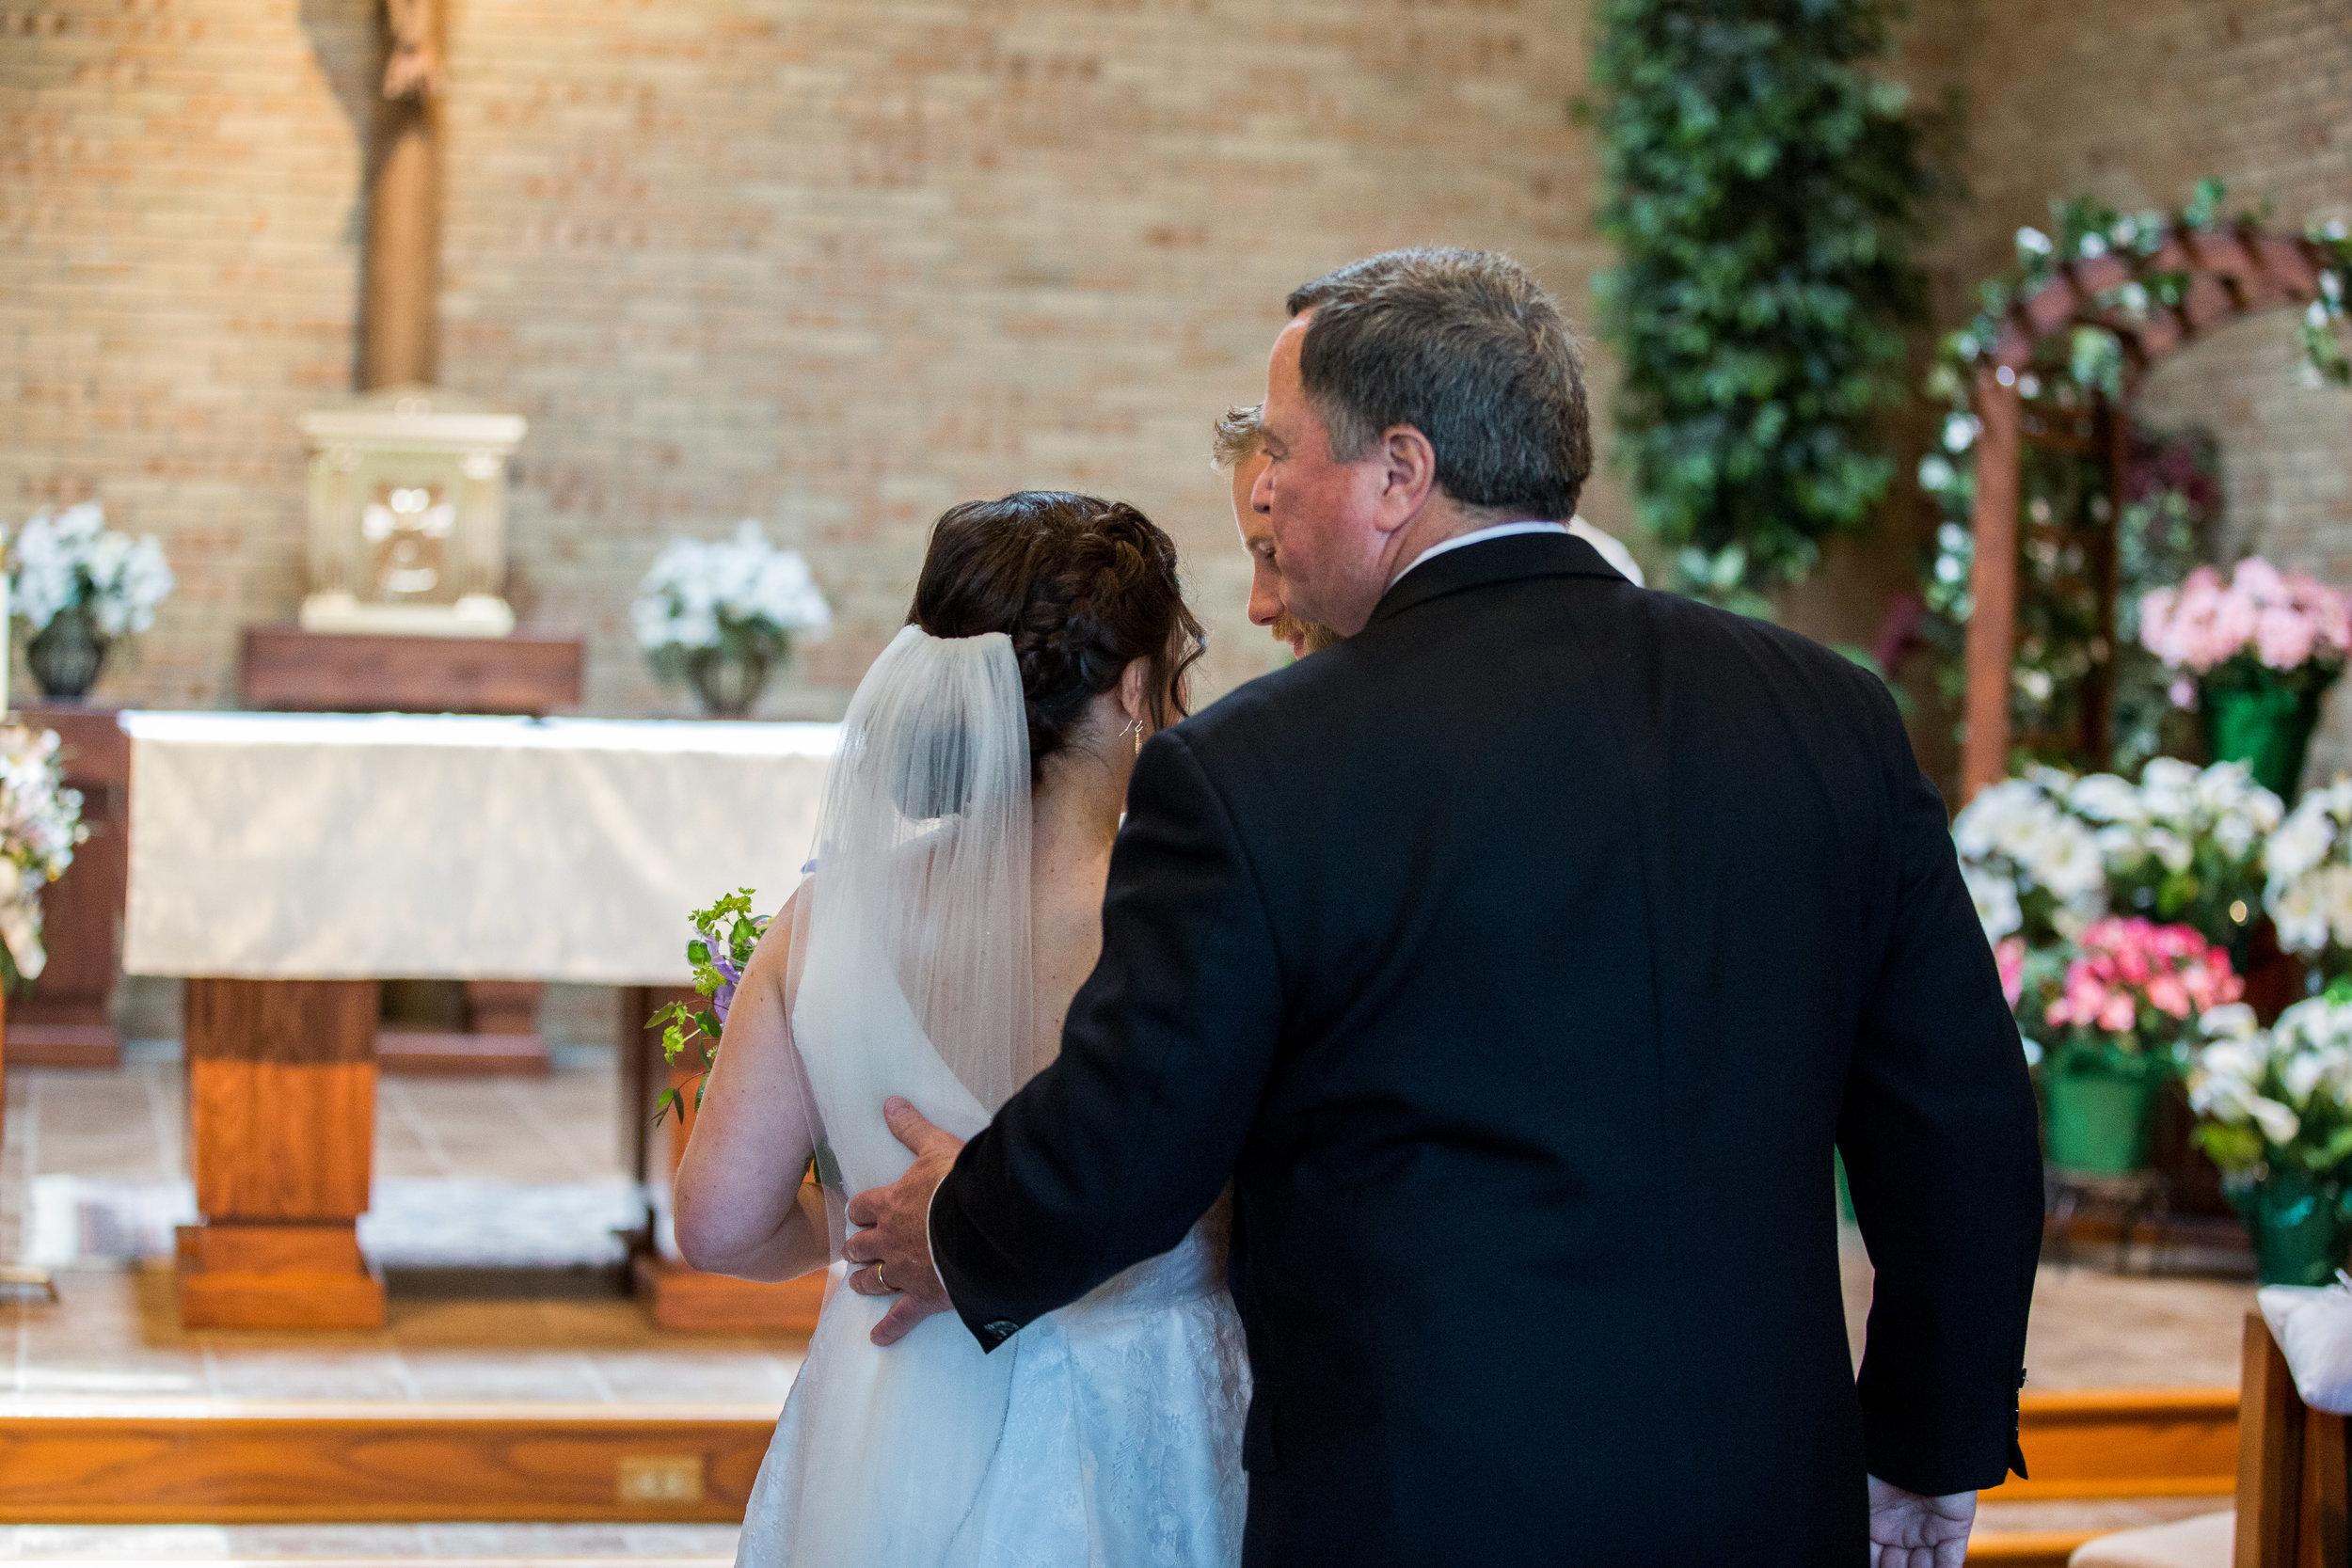 Natalie and Dallas Mooney Wedding 6-8-19_Tania Watt Photography-75.jpg